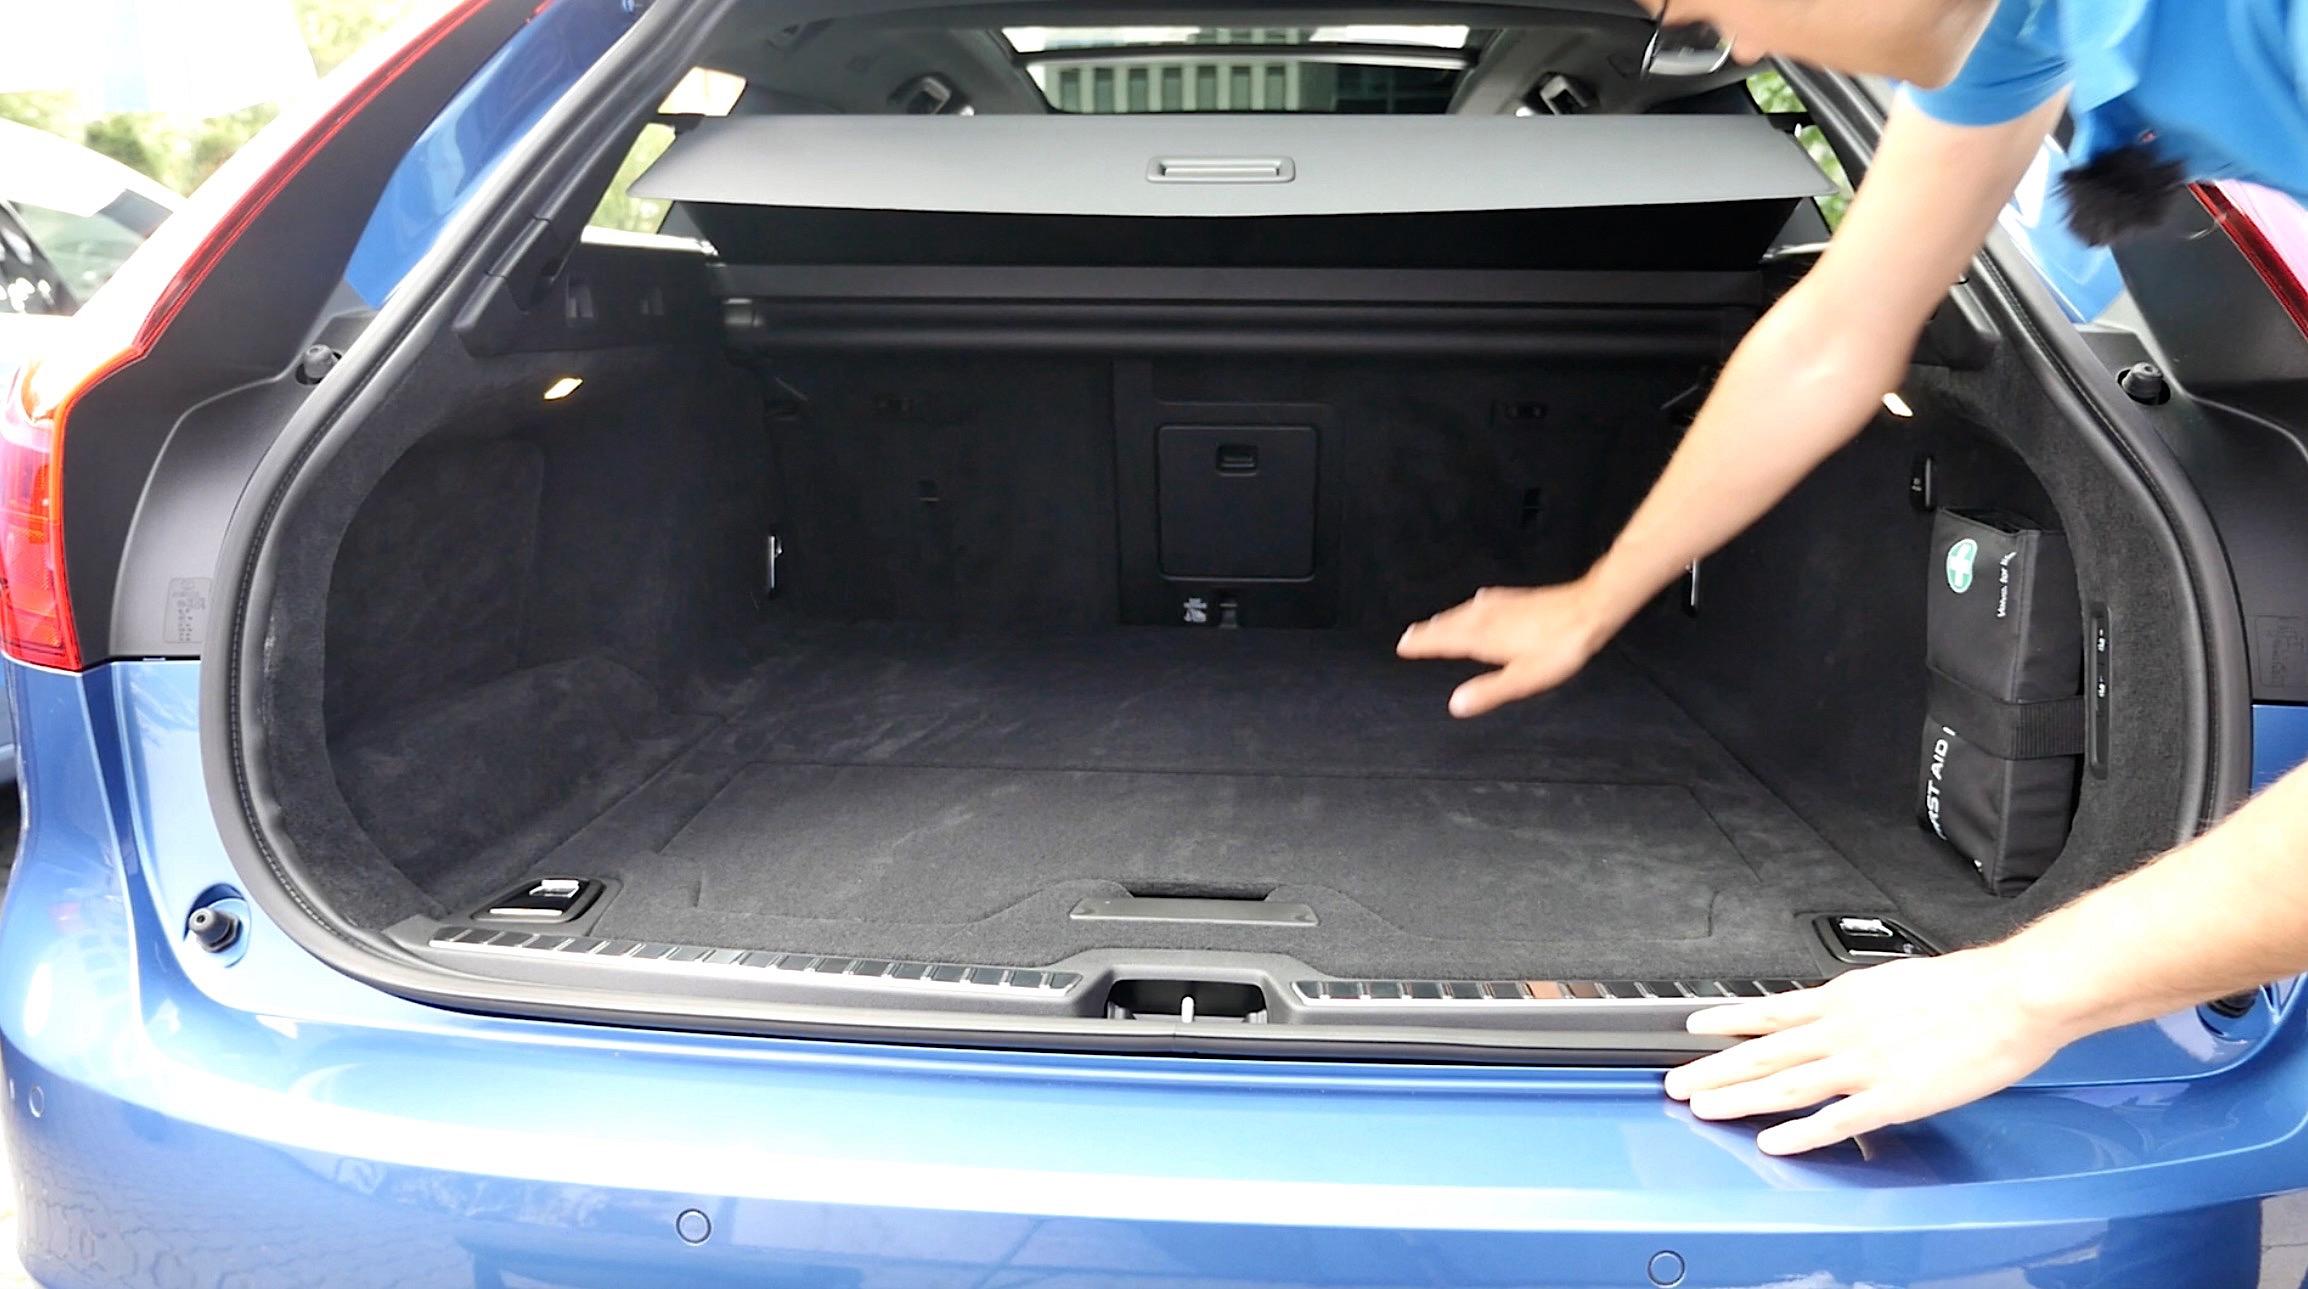 VolvoV90_Kofferraum